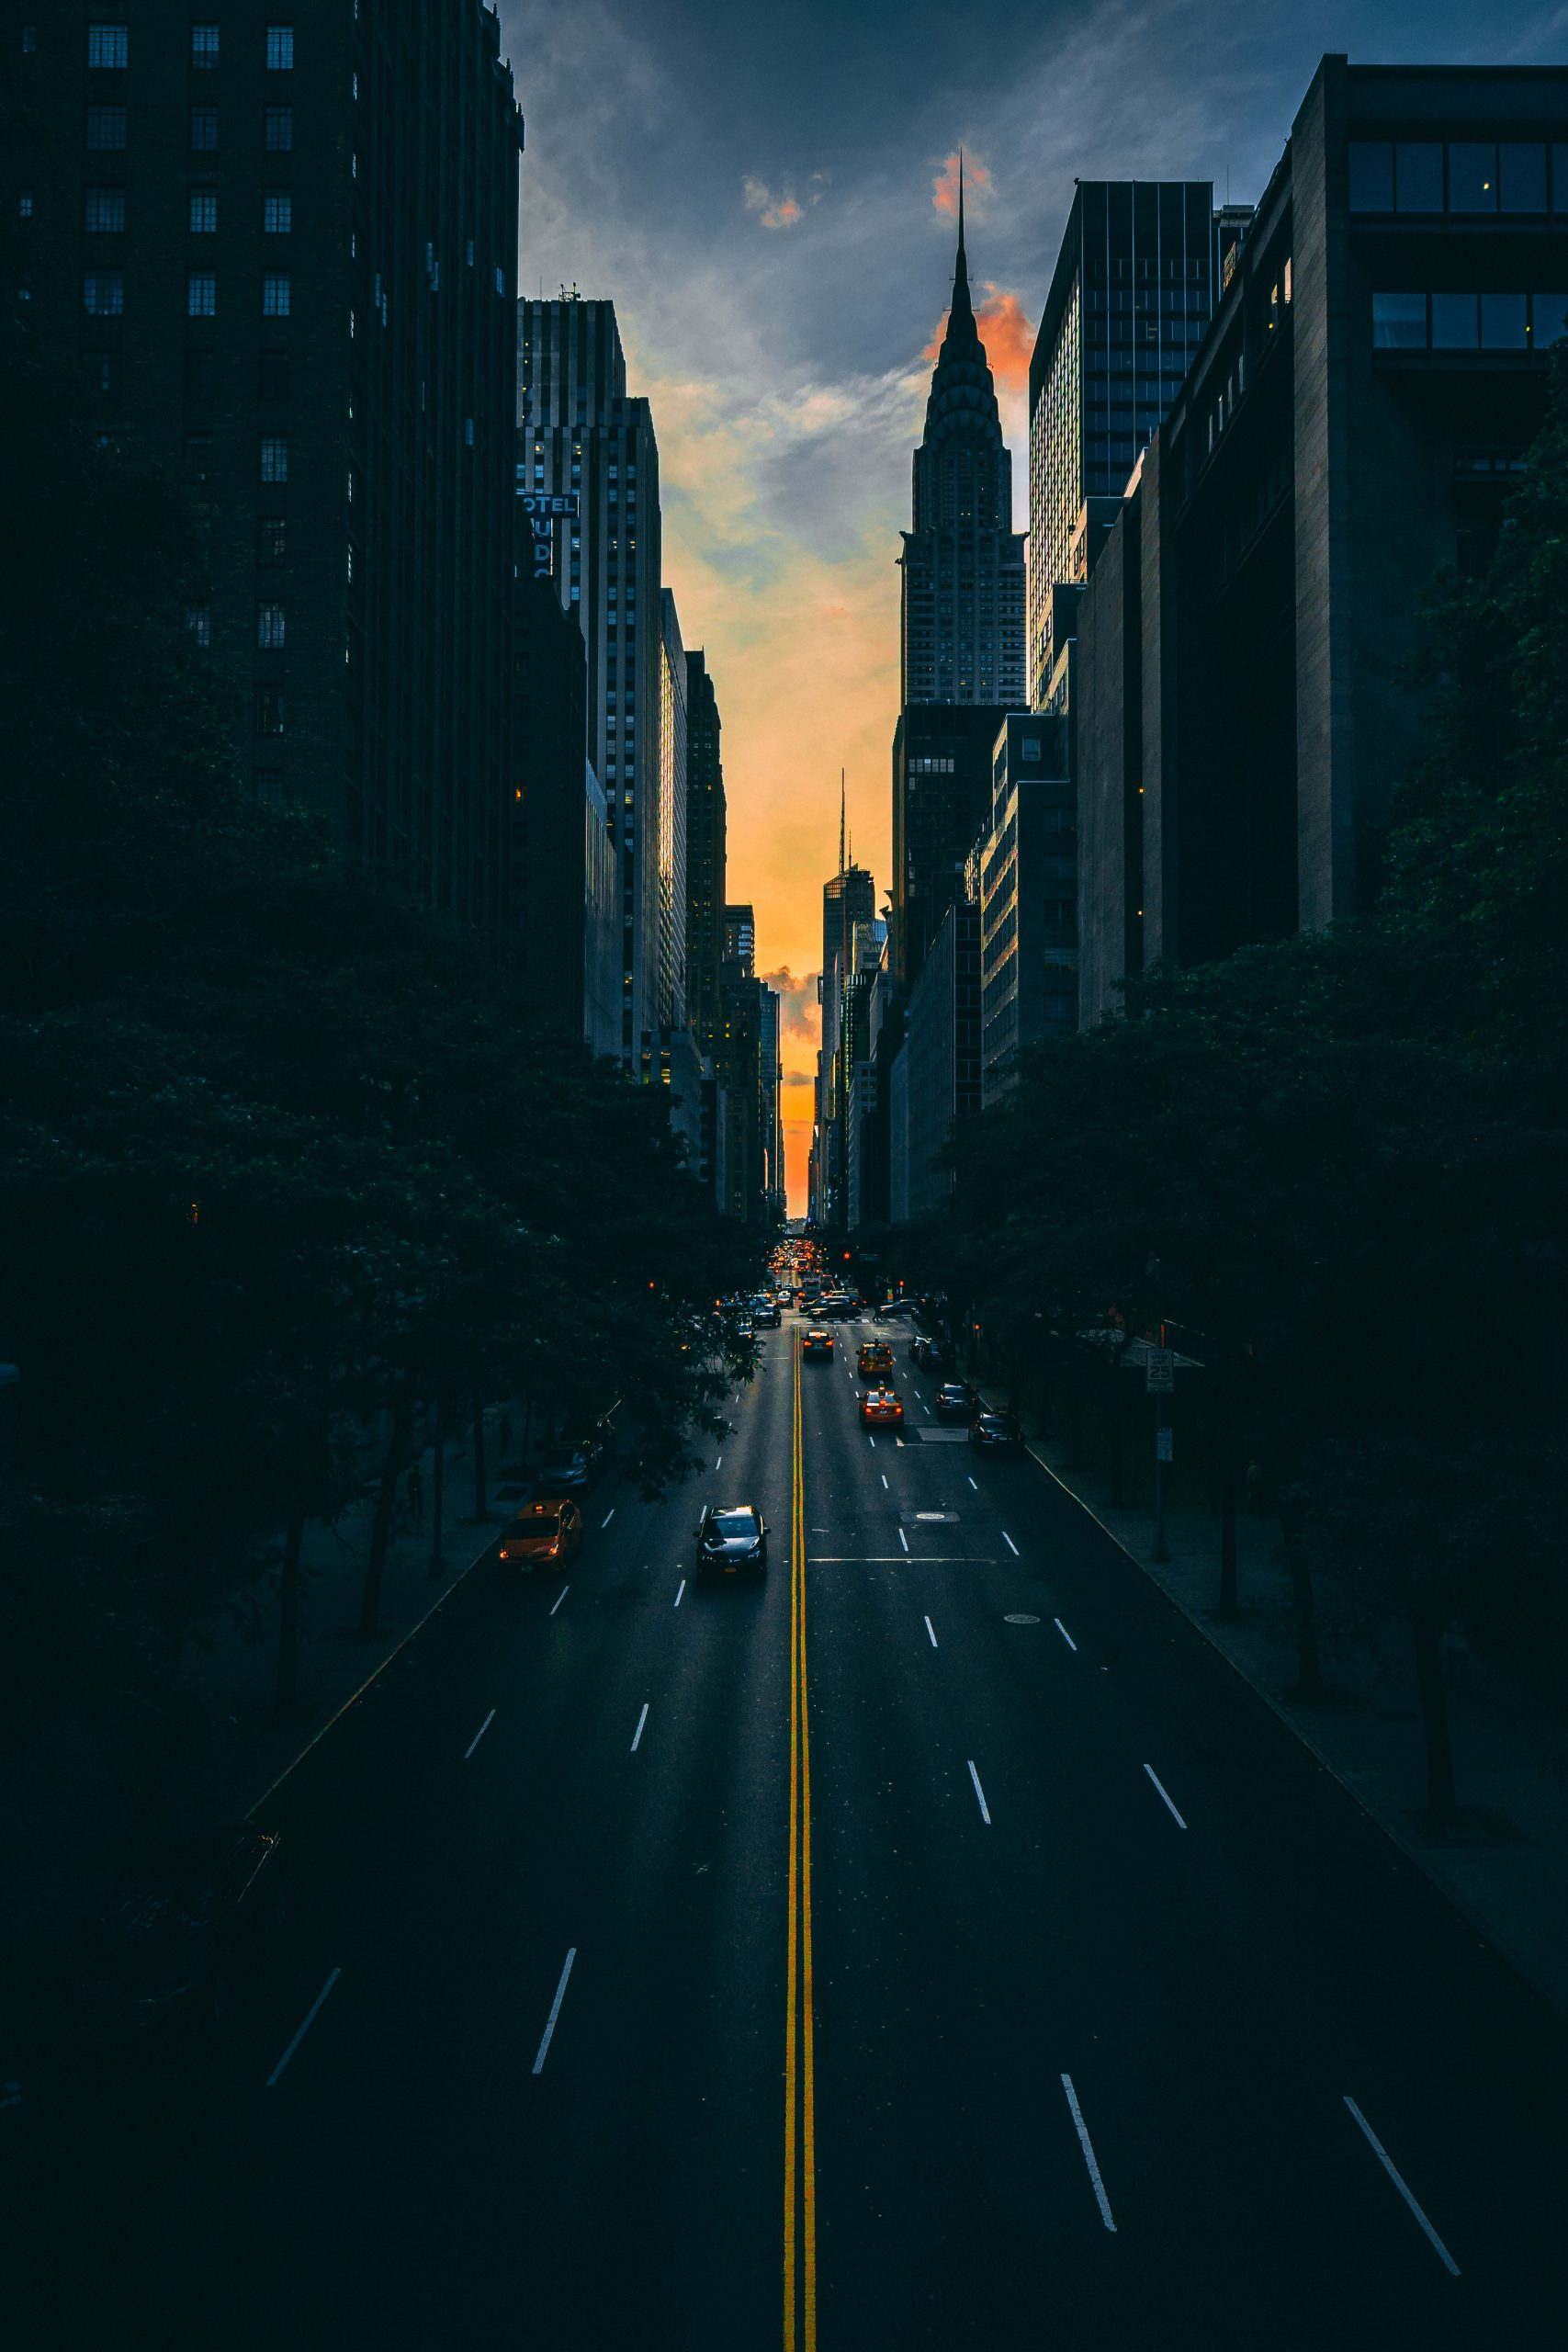 New York City building details